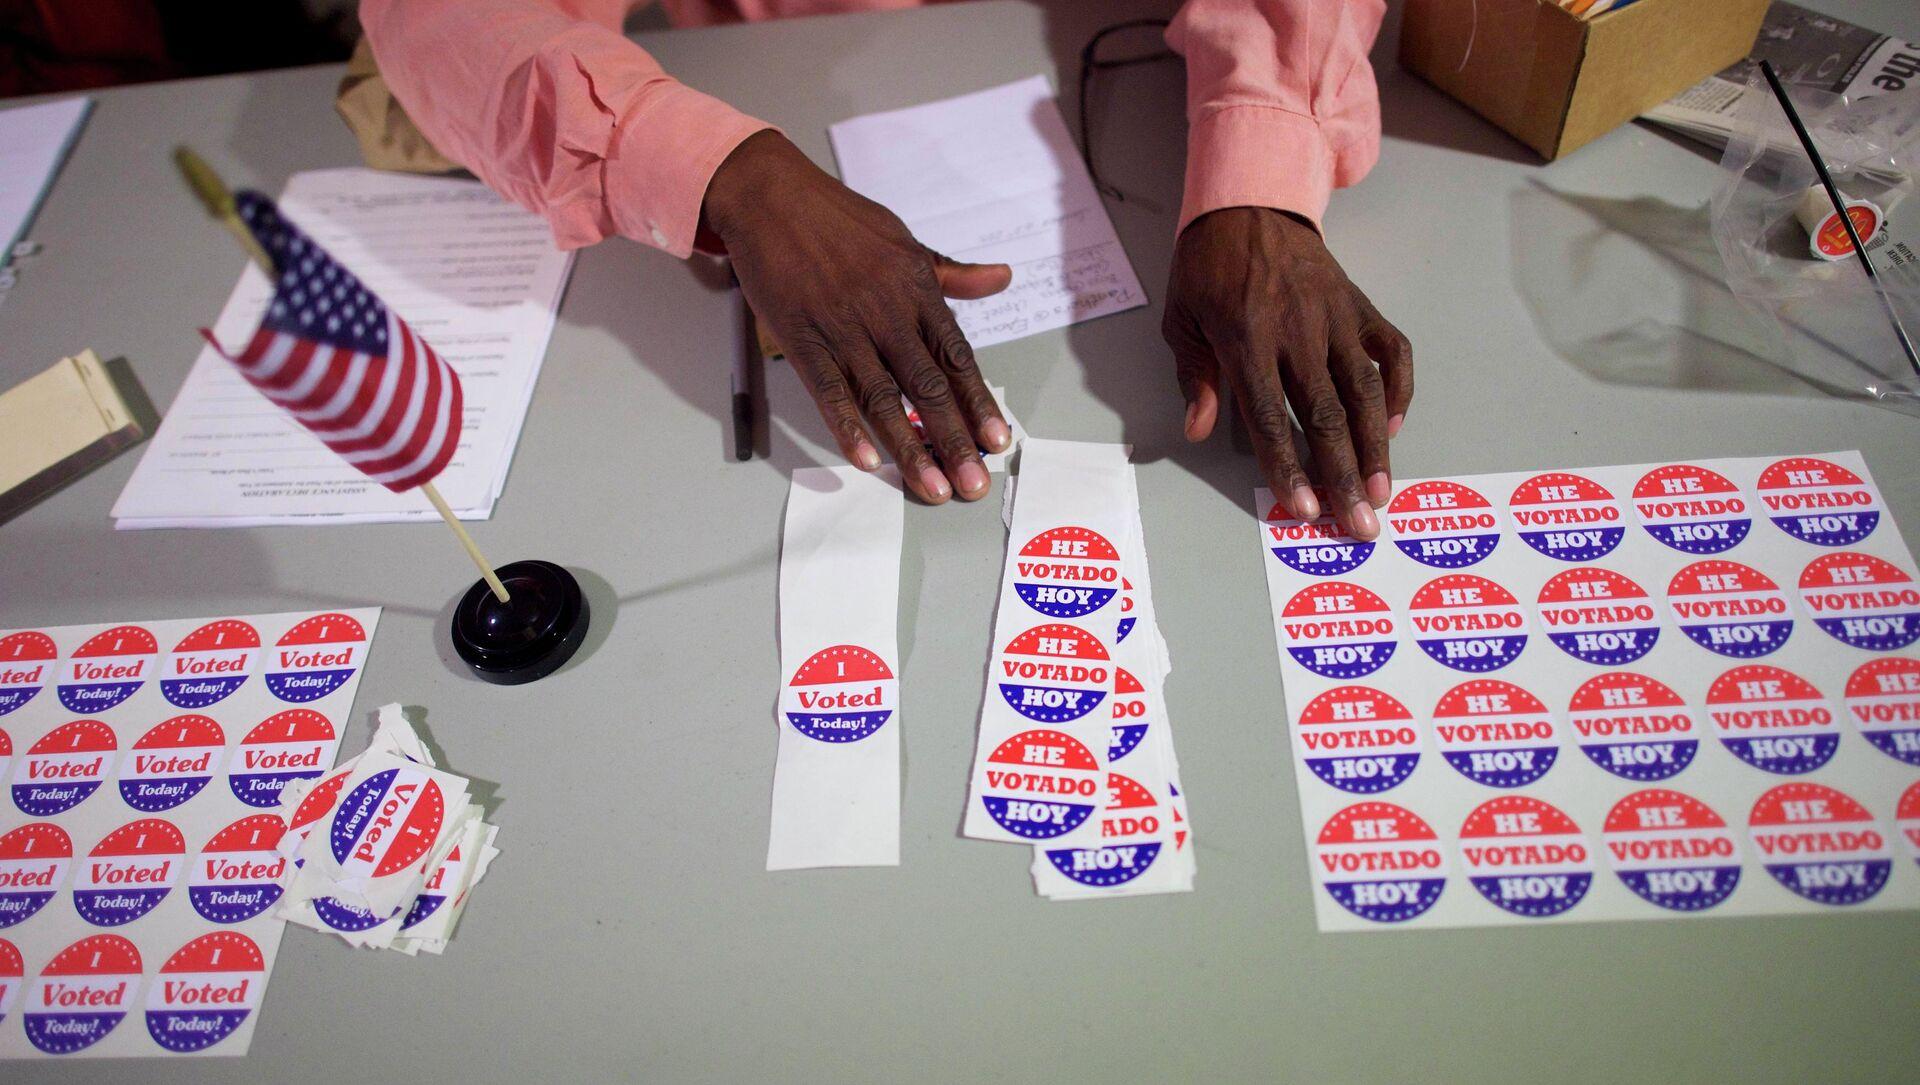 A majority inspector arranges 'I Voted Today!' stickers at registration on U.S. midterm election day morning at Holmes School Senior Center in Philadelphia, Pennsylvania, November 4, 2014 - Sputnik International, 1920, 28.07.2021